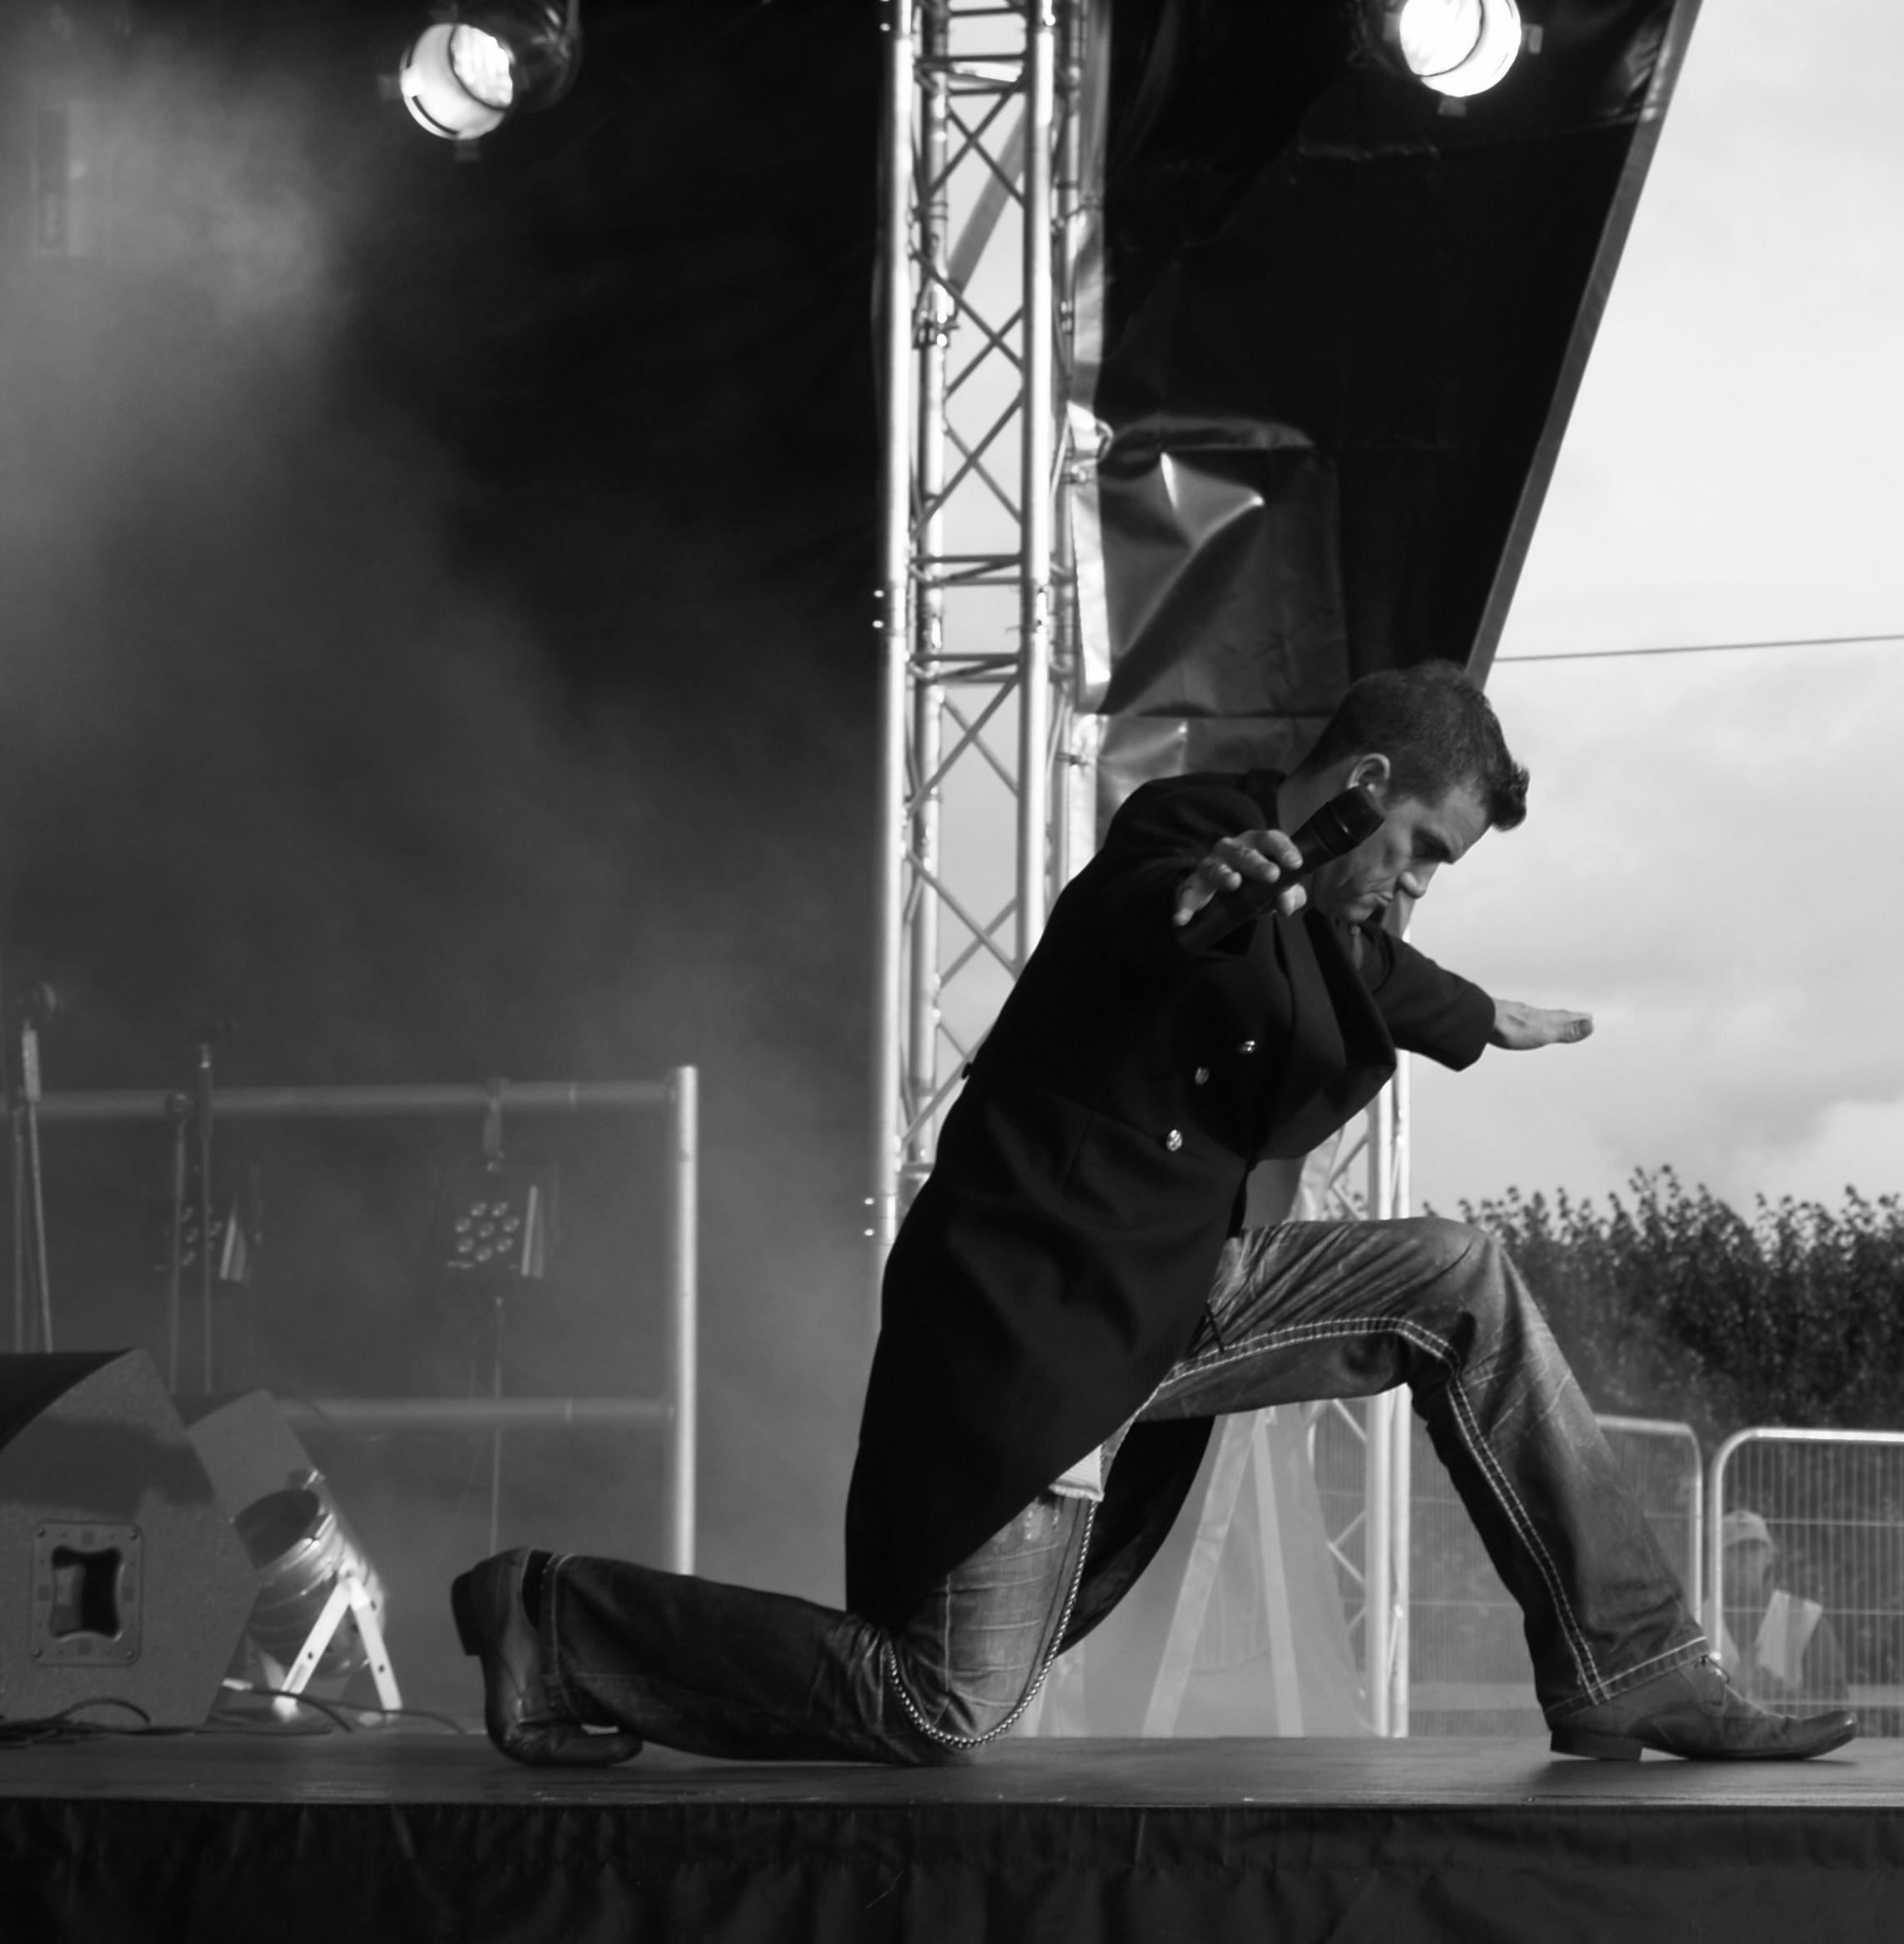 Robbie Tribute Act - Matt Byrne